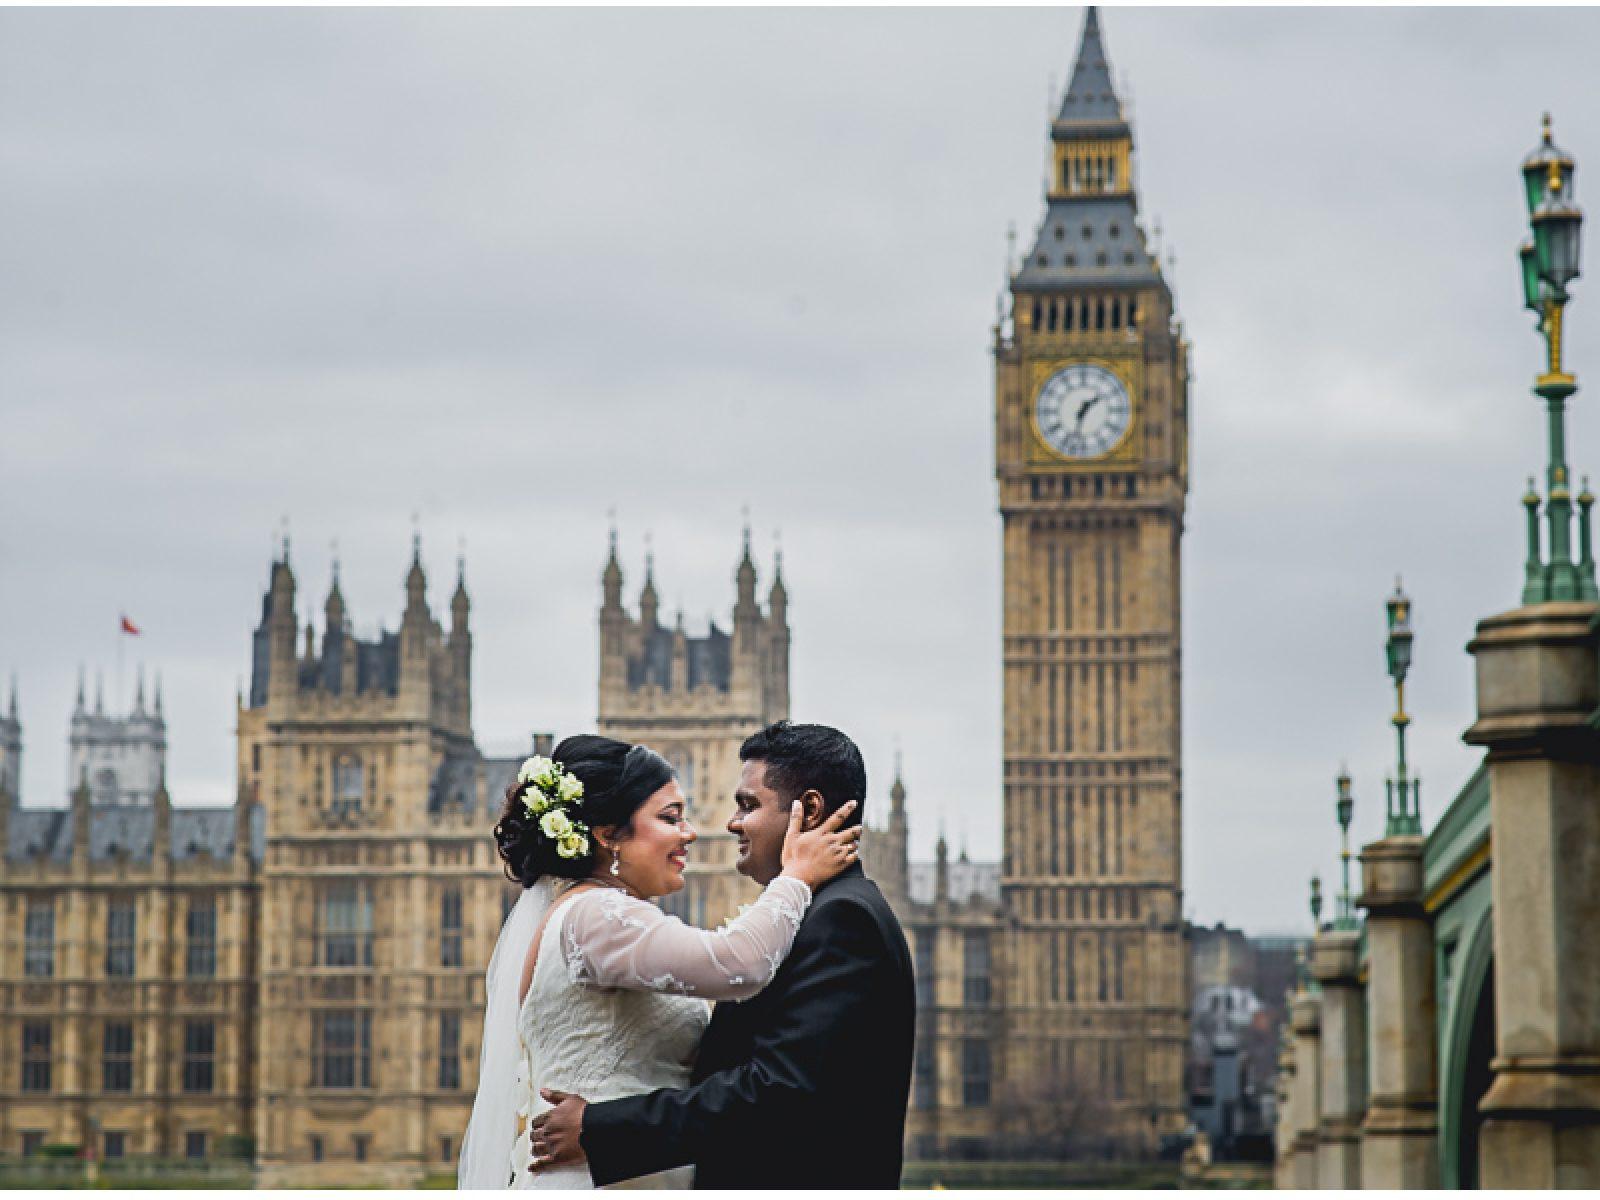 Documentary Wedding Photographer Guide